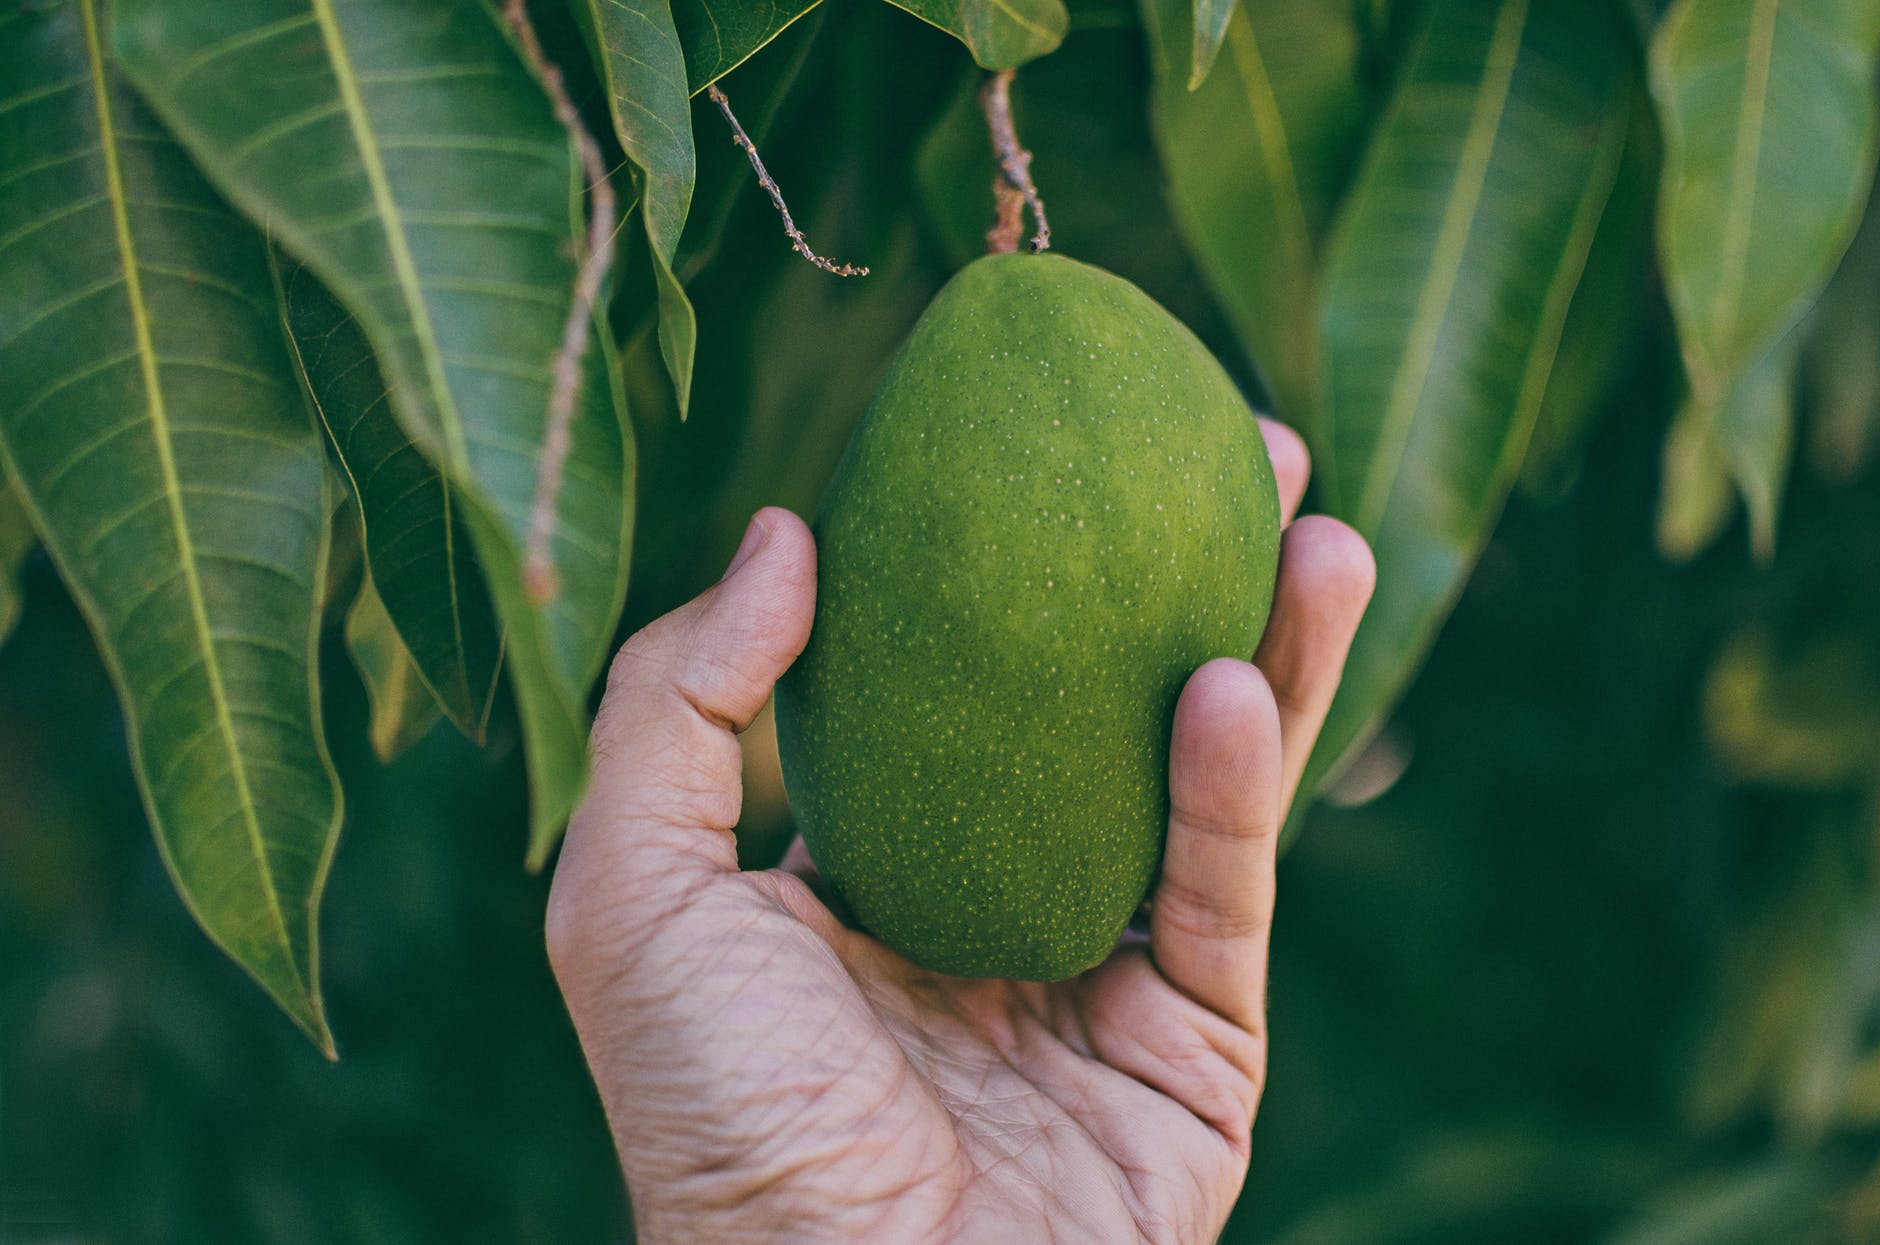 close up photo of person holding unripe mango